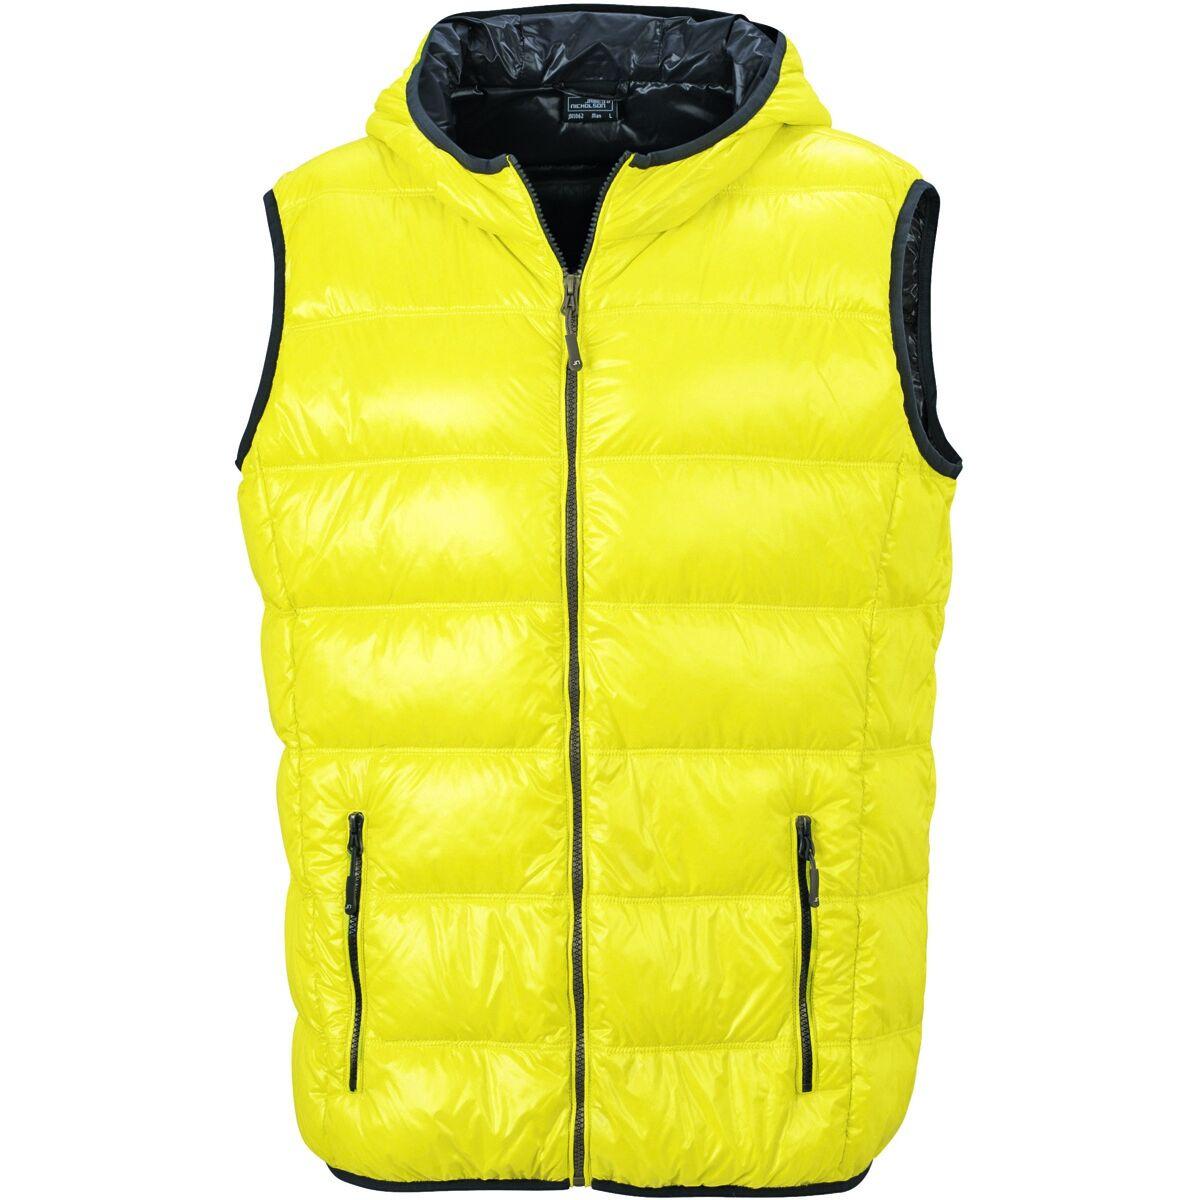 Bodywarmer duvet doudoune sans manches anorak homme - JN1062 - jaune